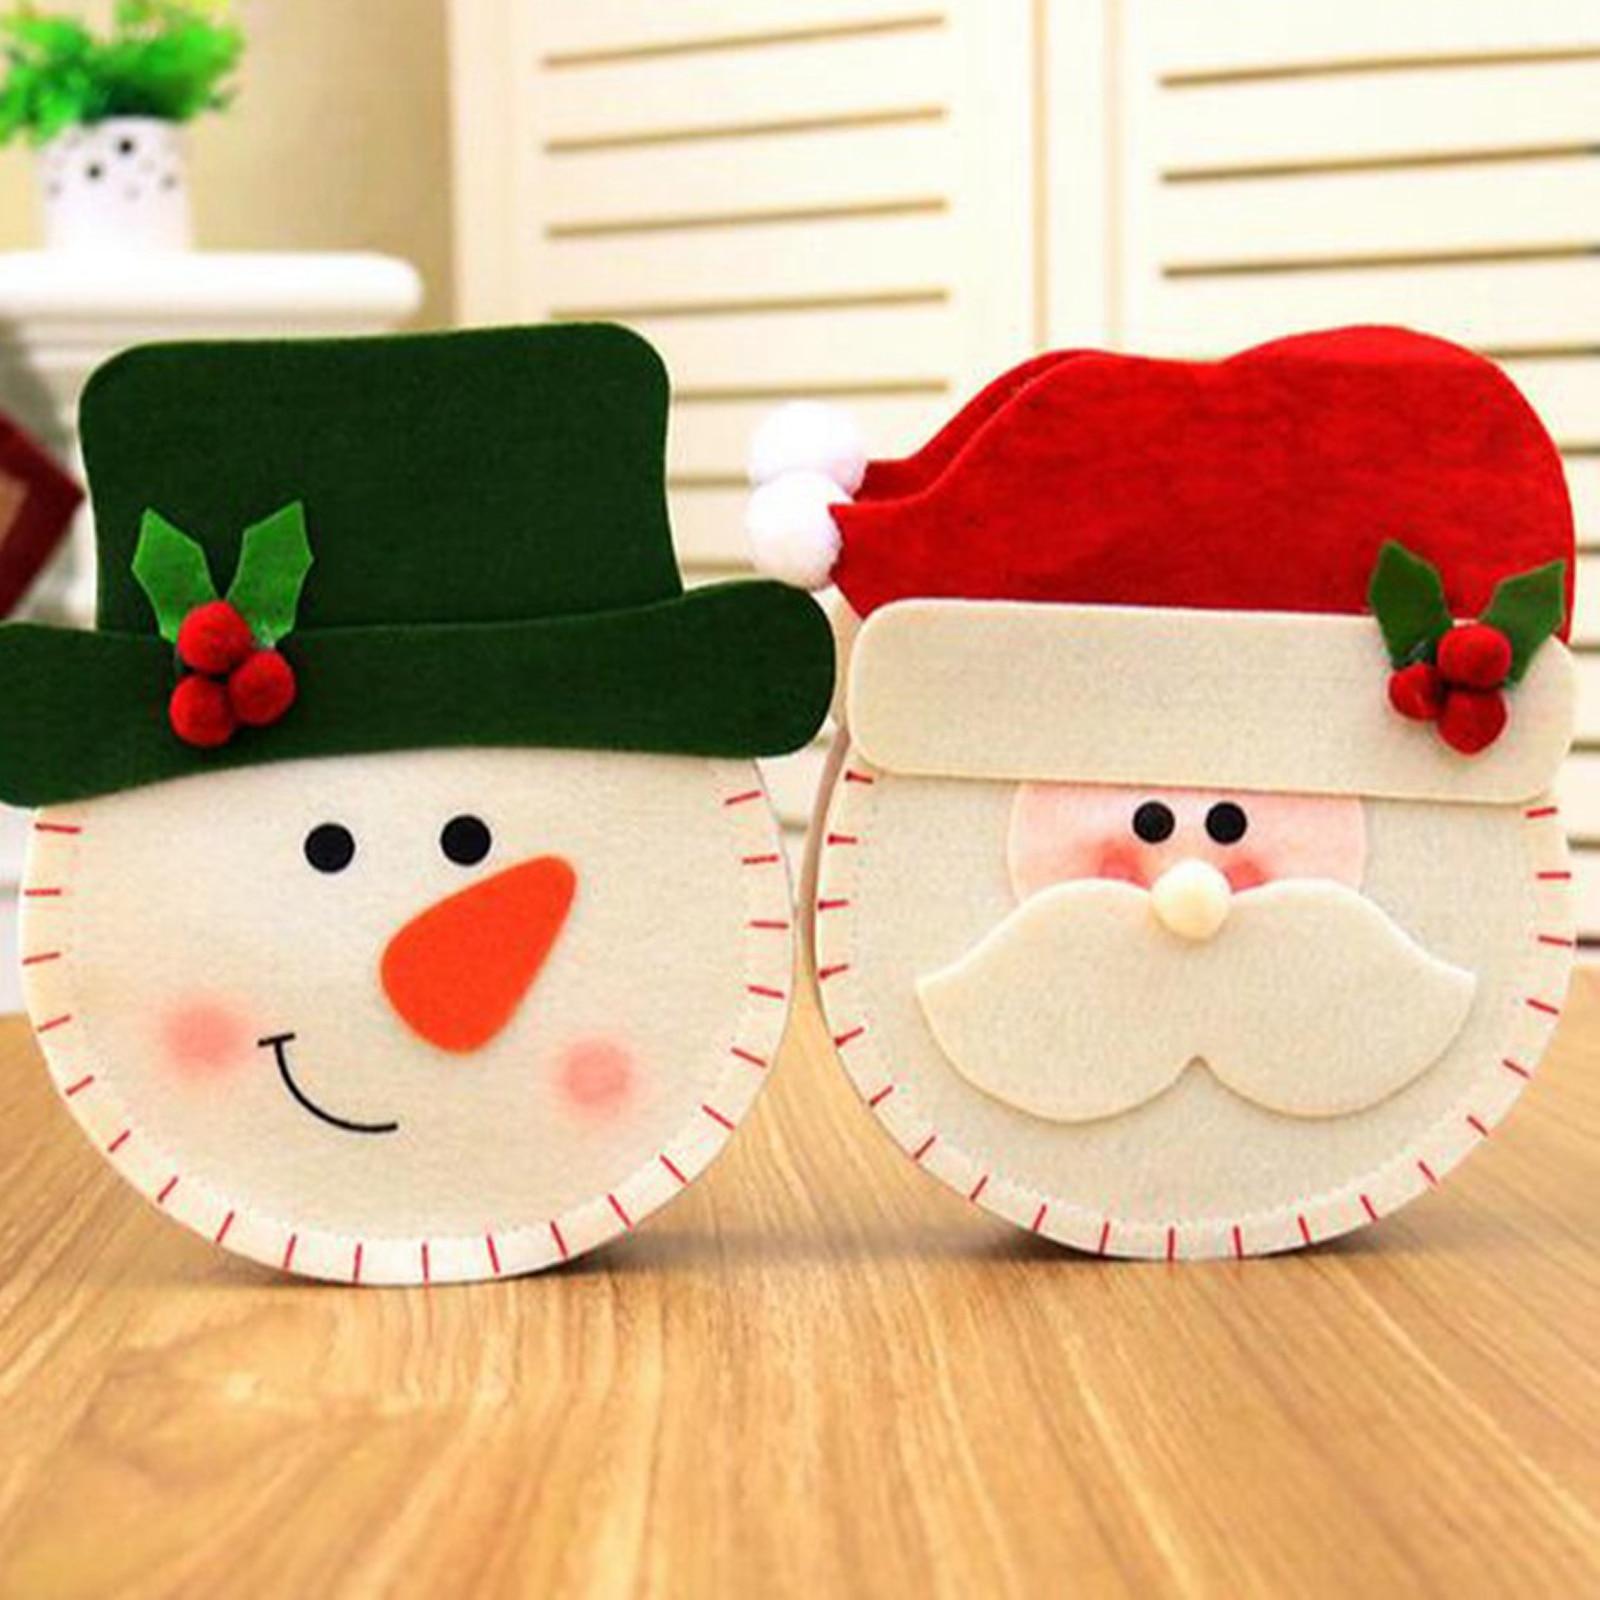 Christmas Creative Candy Bag Merry Christmas Non-woven Fabric Cute Cartoon Santa Claus Snowman Elk Handbag Hanging Bags